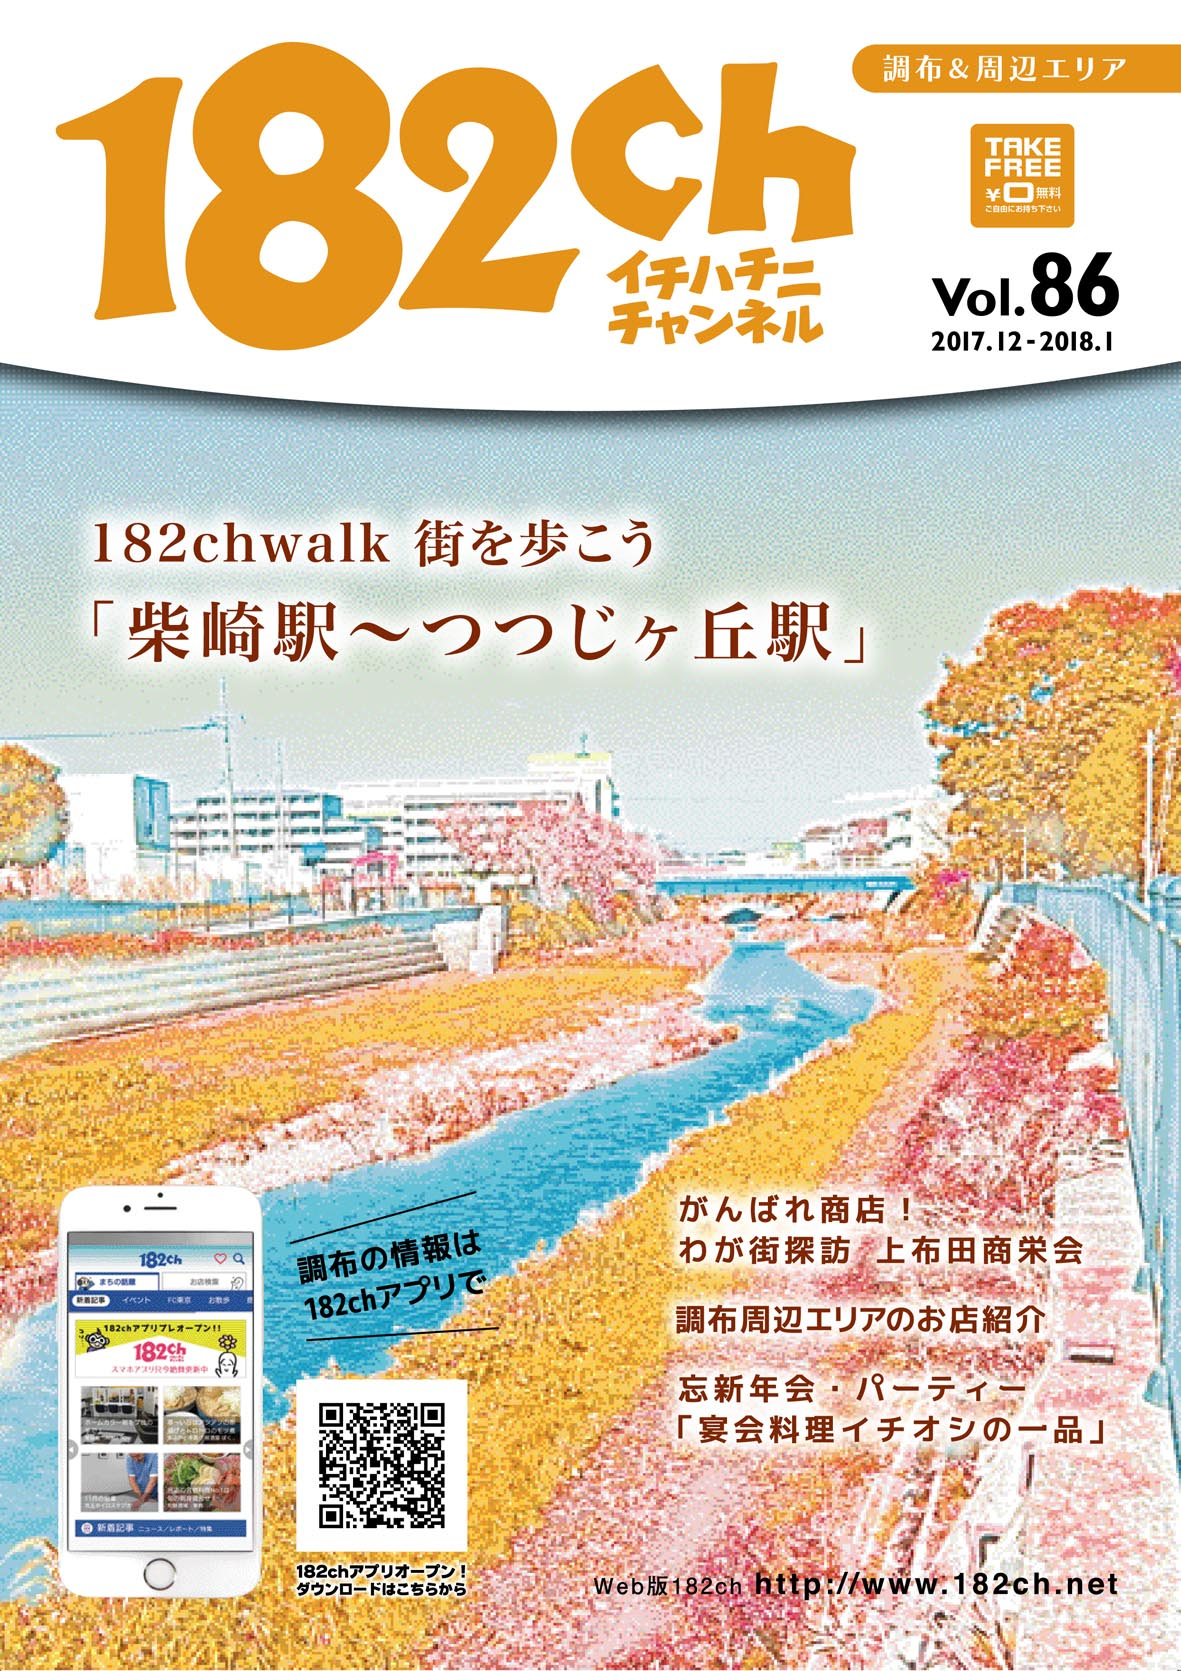 182ch vol.86